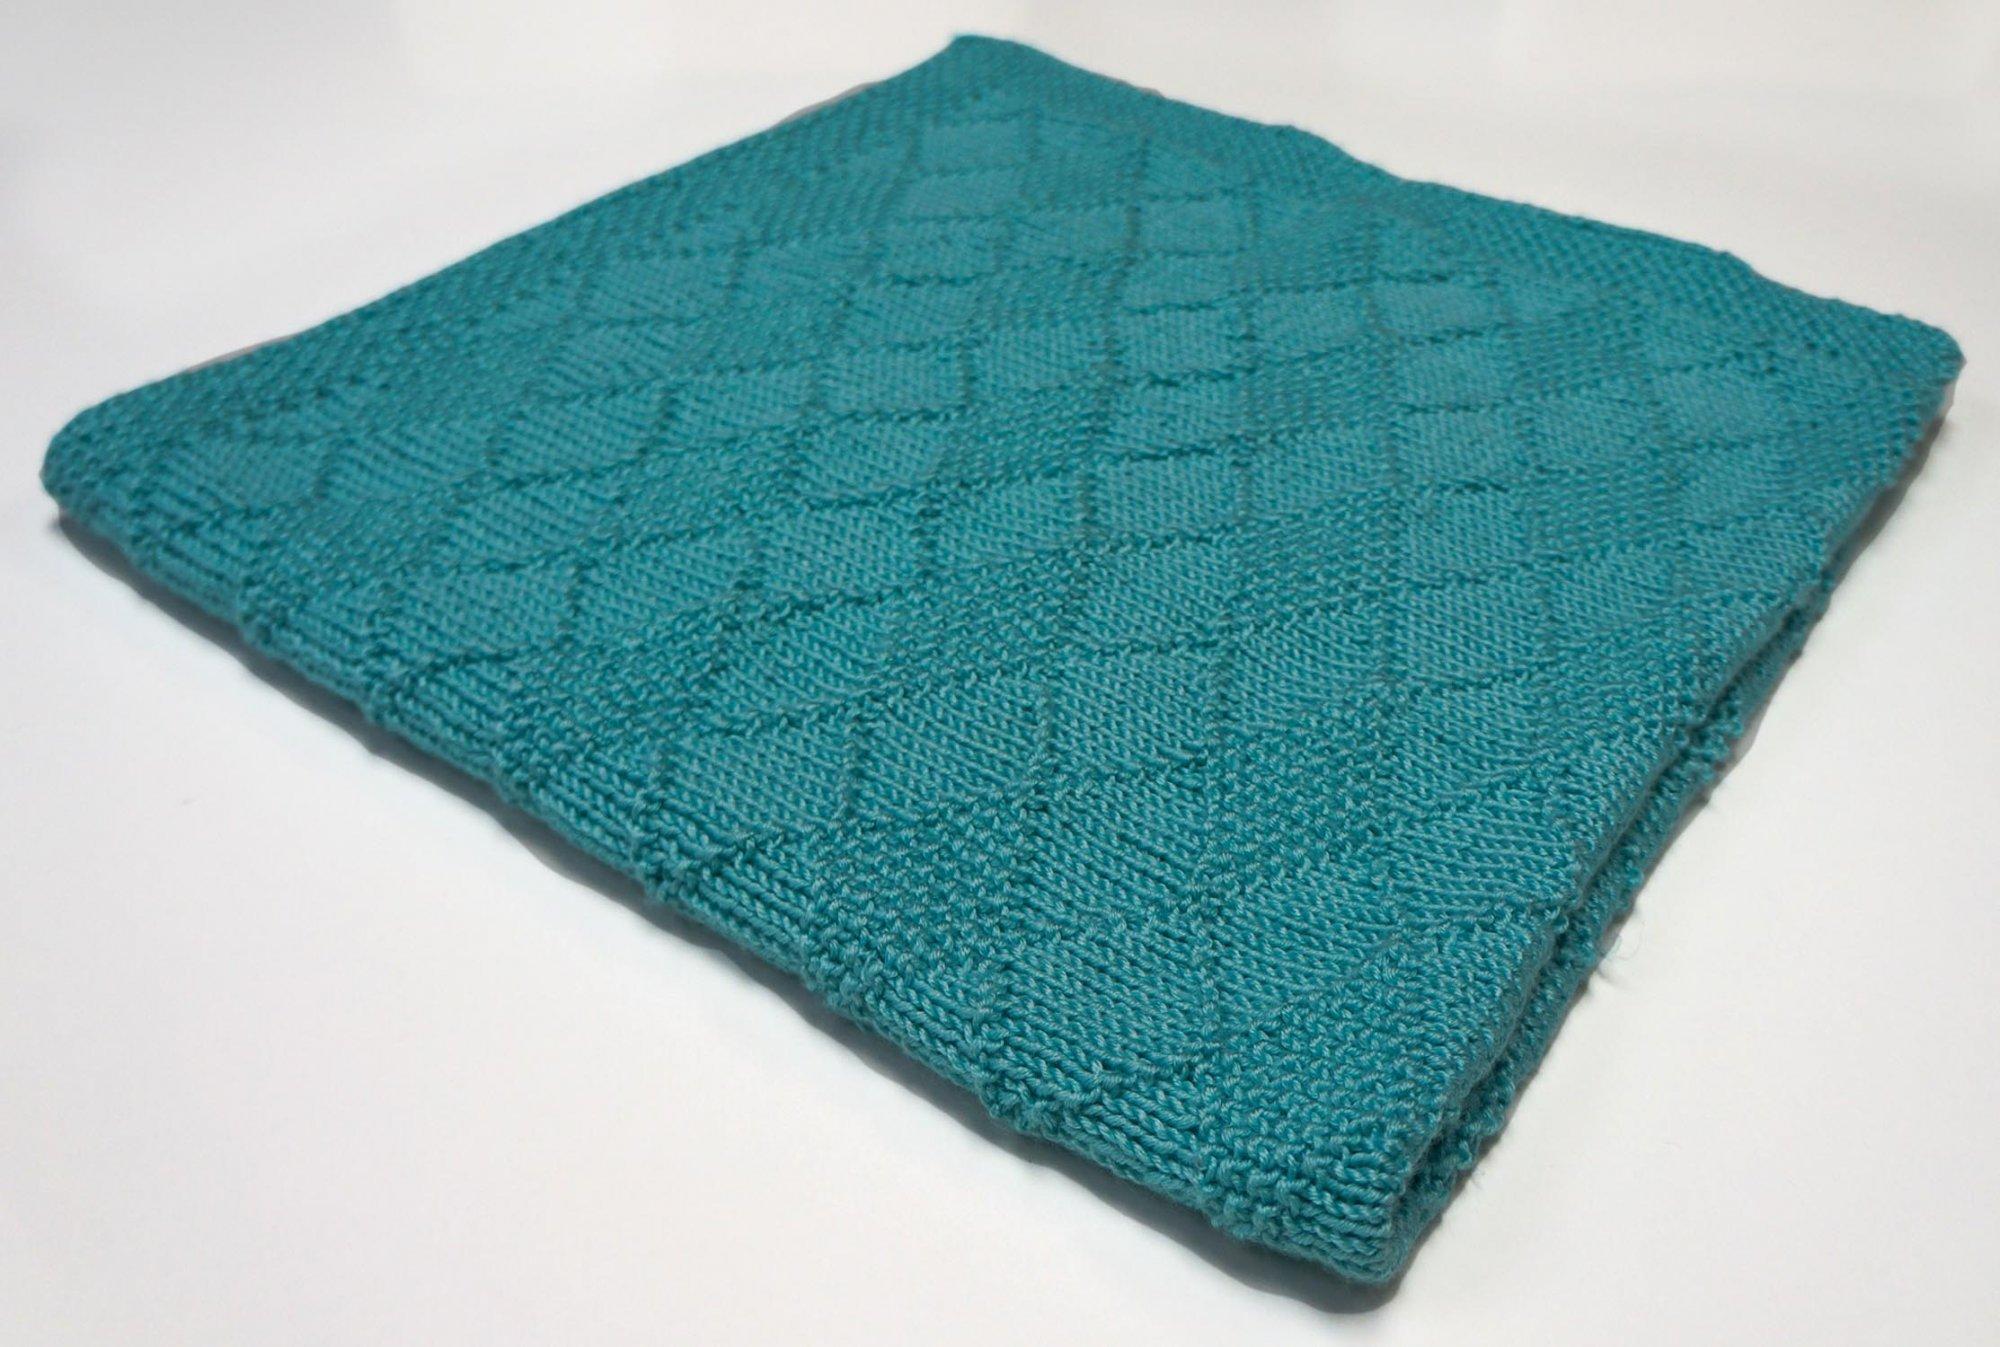 Diamond Seed Stitch Baby Blanket Kit (SHEEP THRILLS Exclusive)